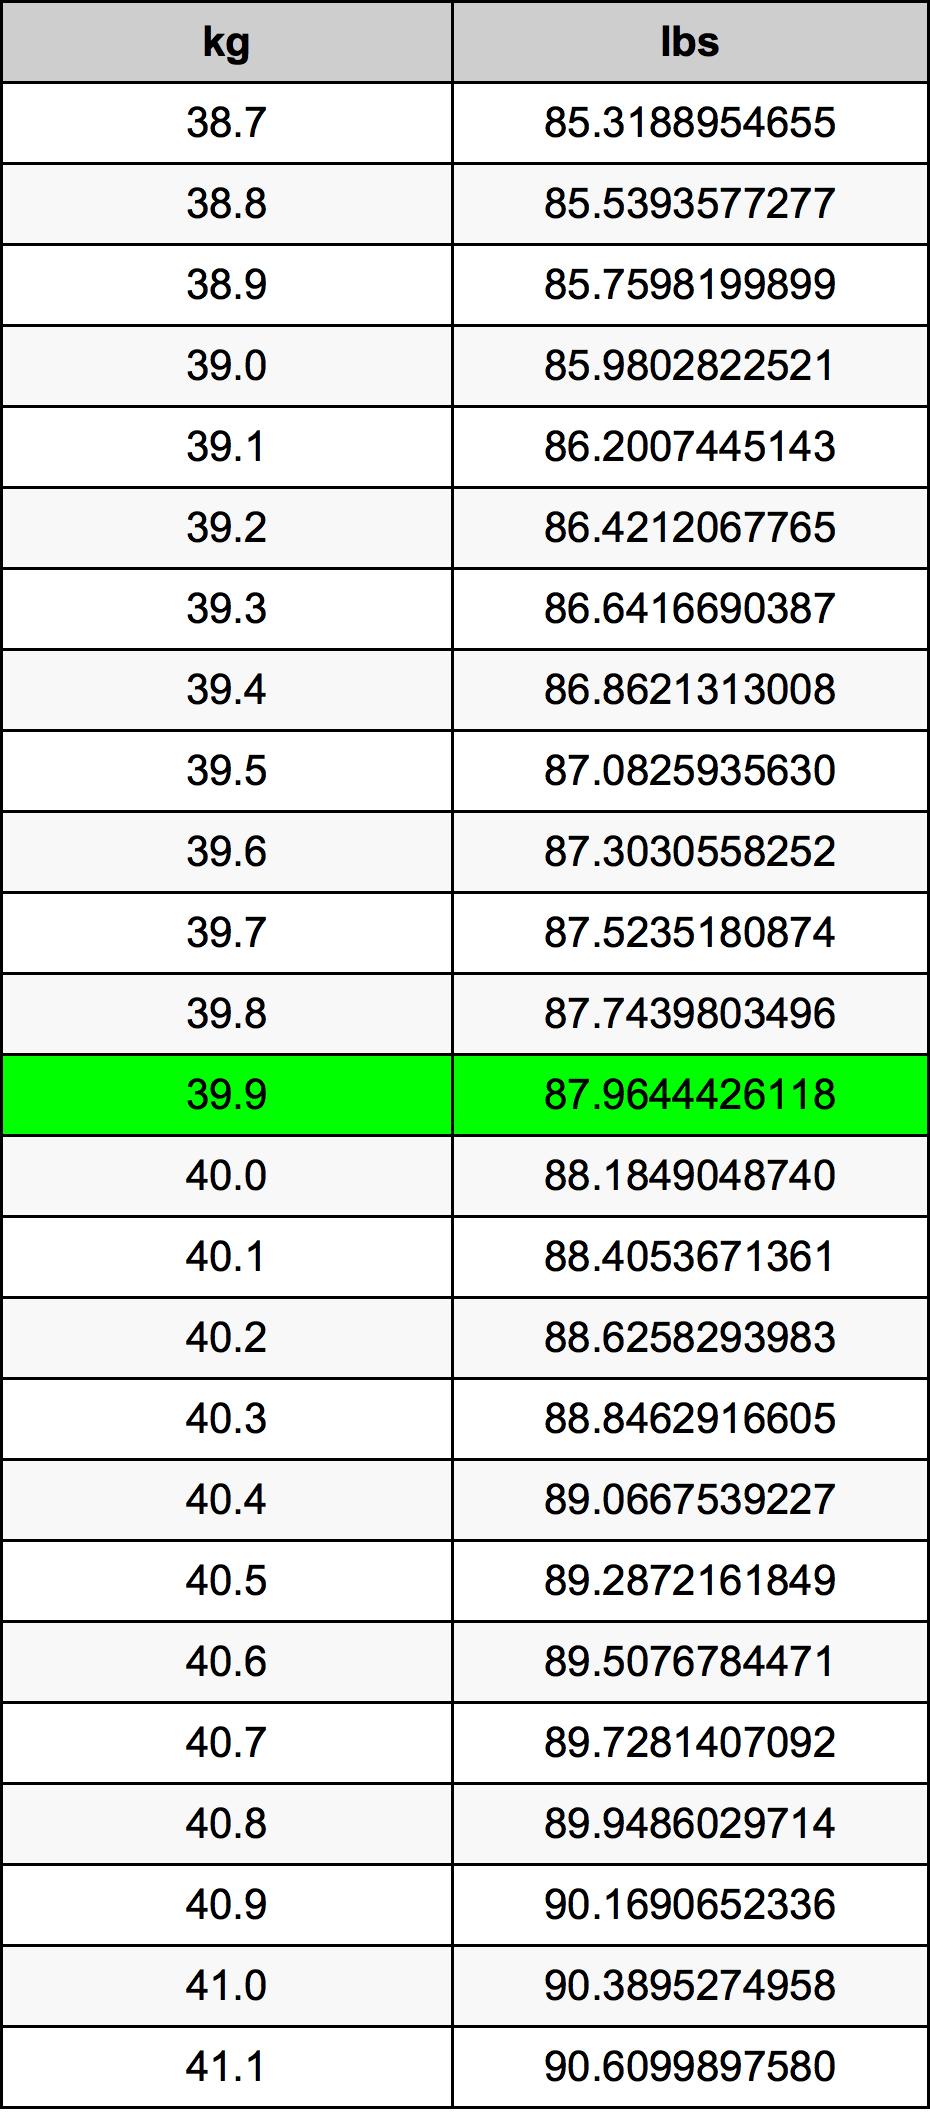 39.9 Kilogram tabelul de conversie